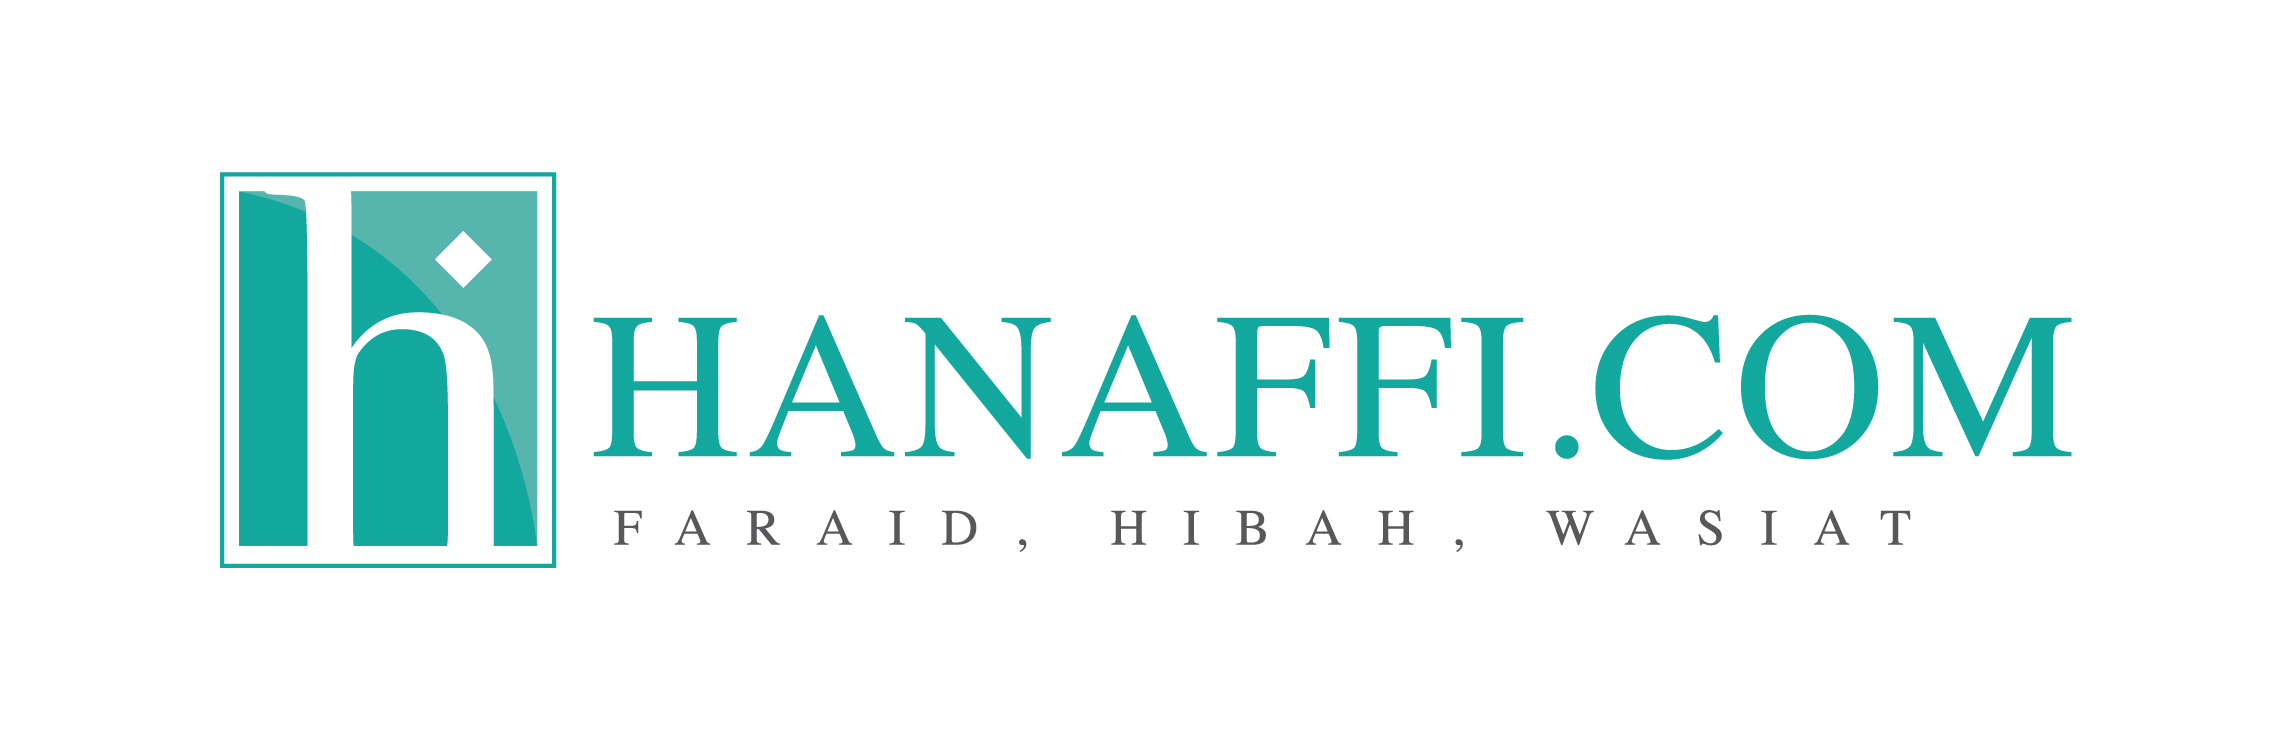 hanaffi.com